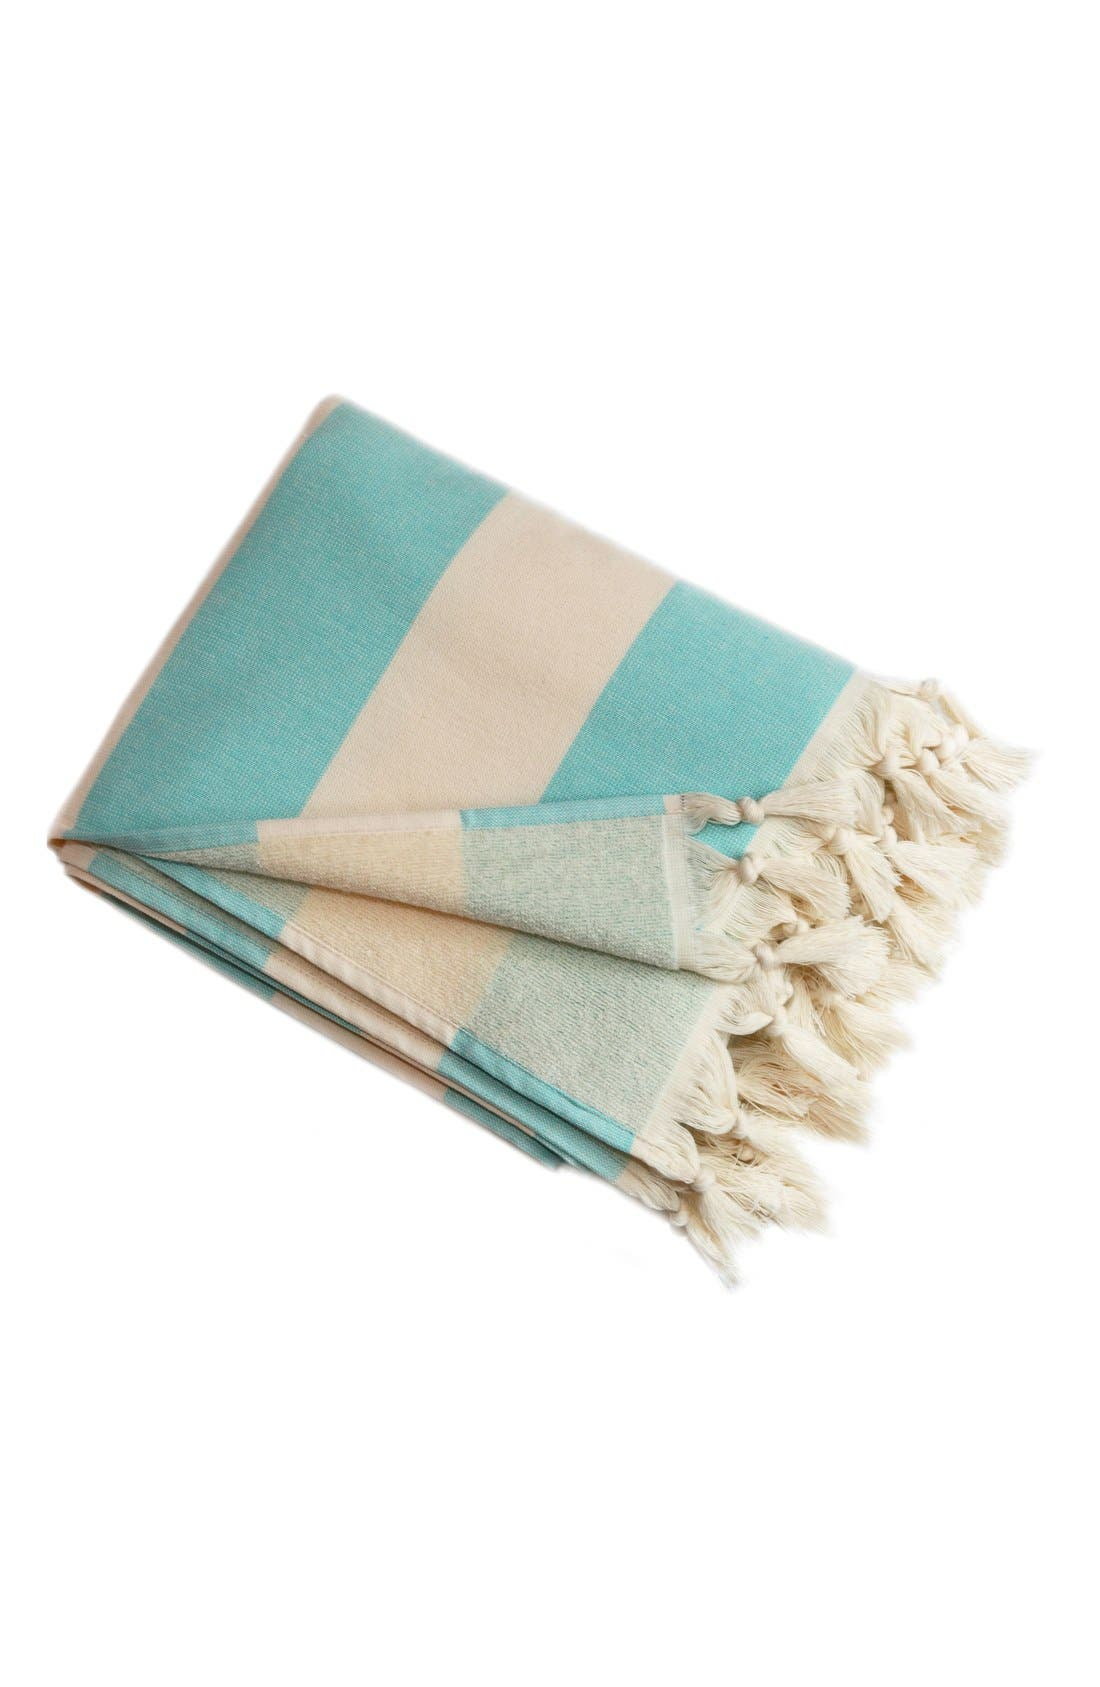 'Patara' Turkish Pestemal Towel,                             Main thumbnail 1, color,                             Turquiose